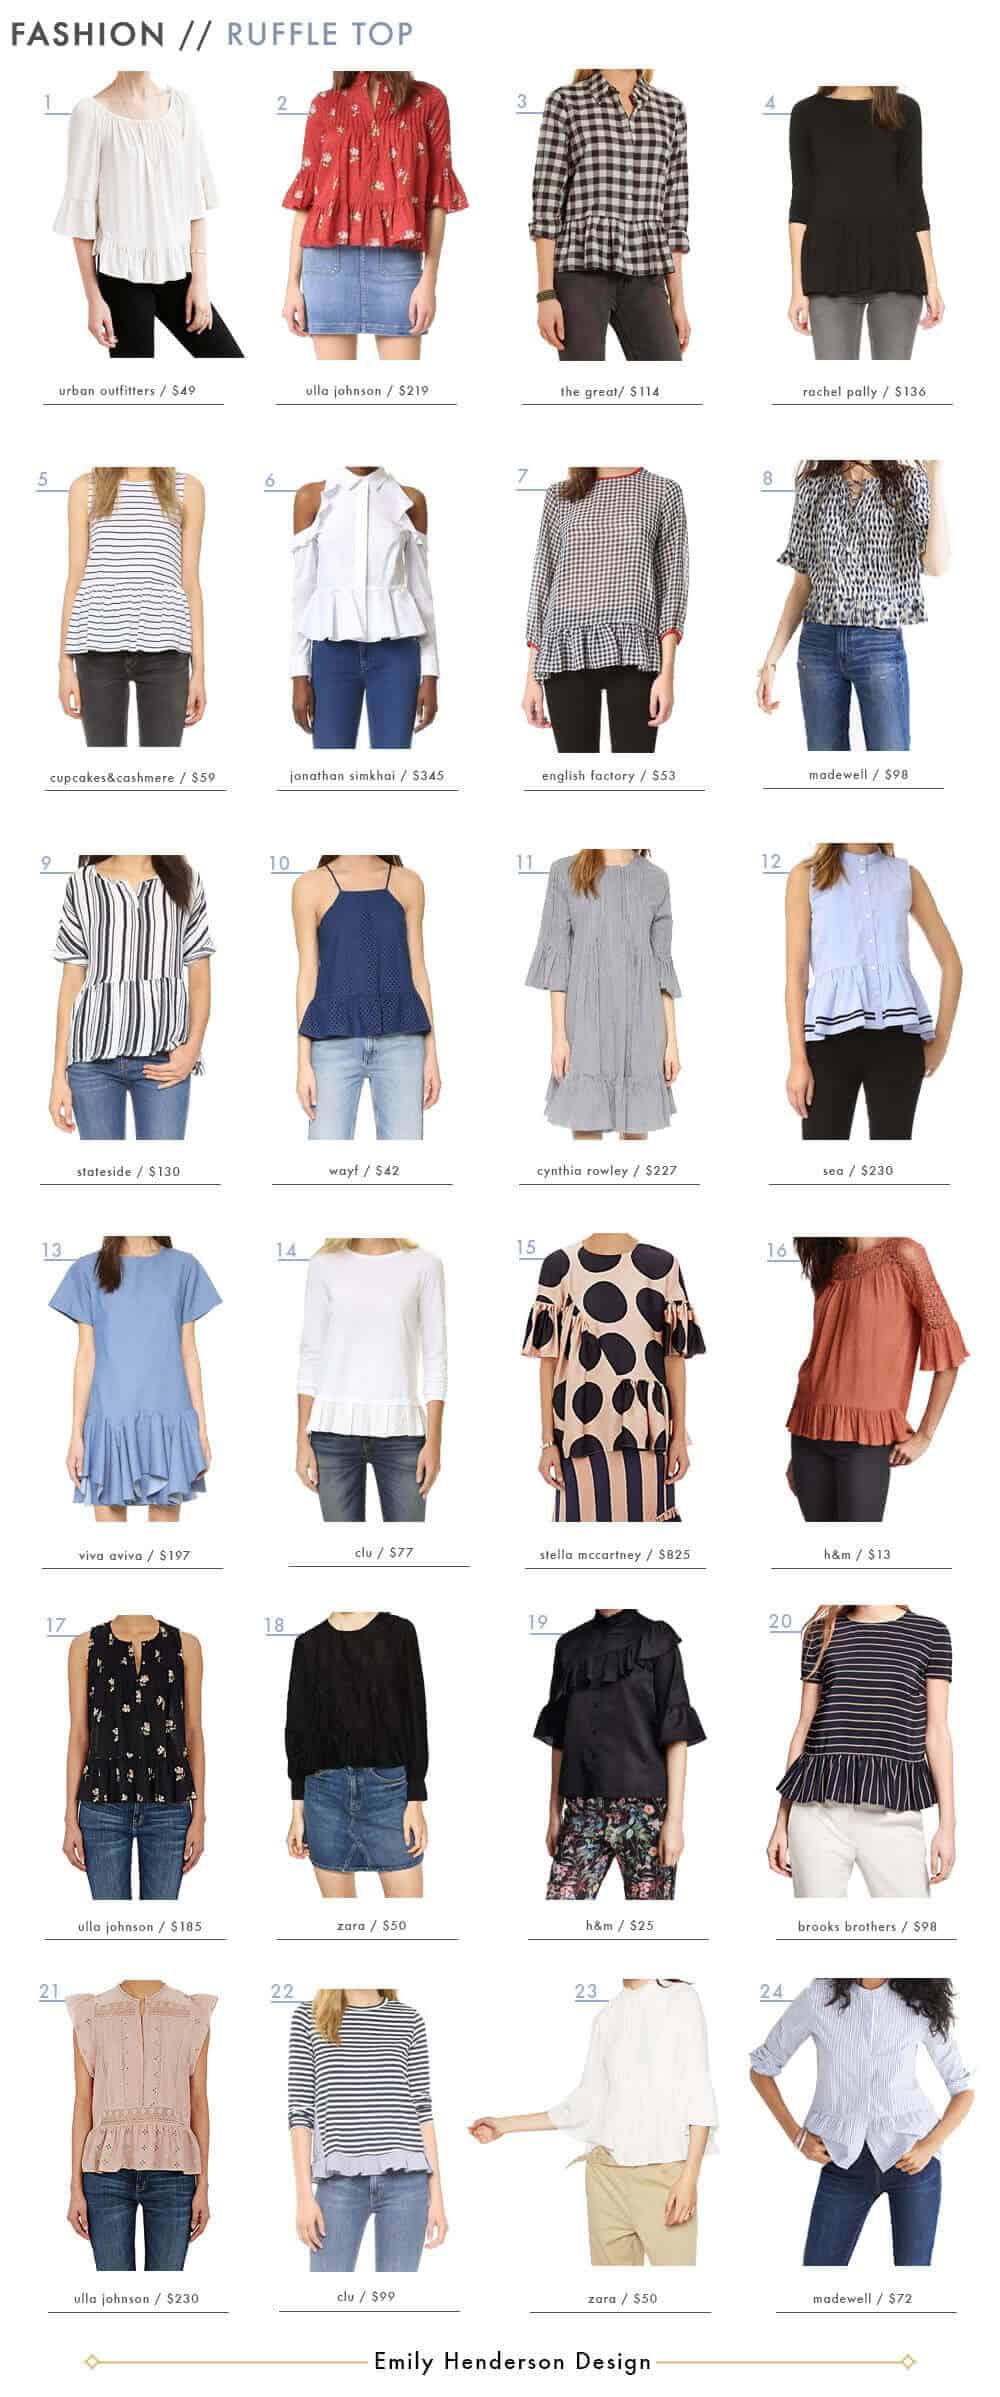 Ruffle Top Roundup Womens Fashion Emily Henderson Design4